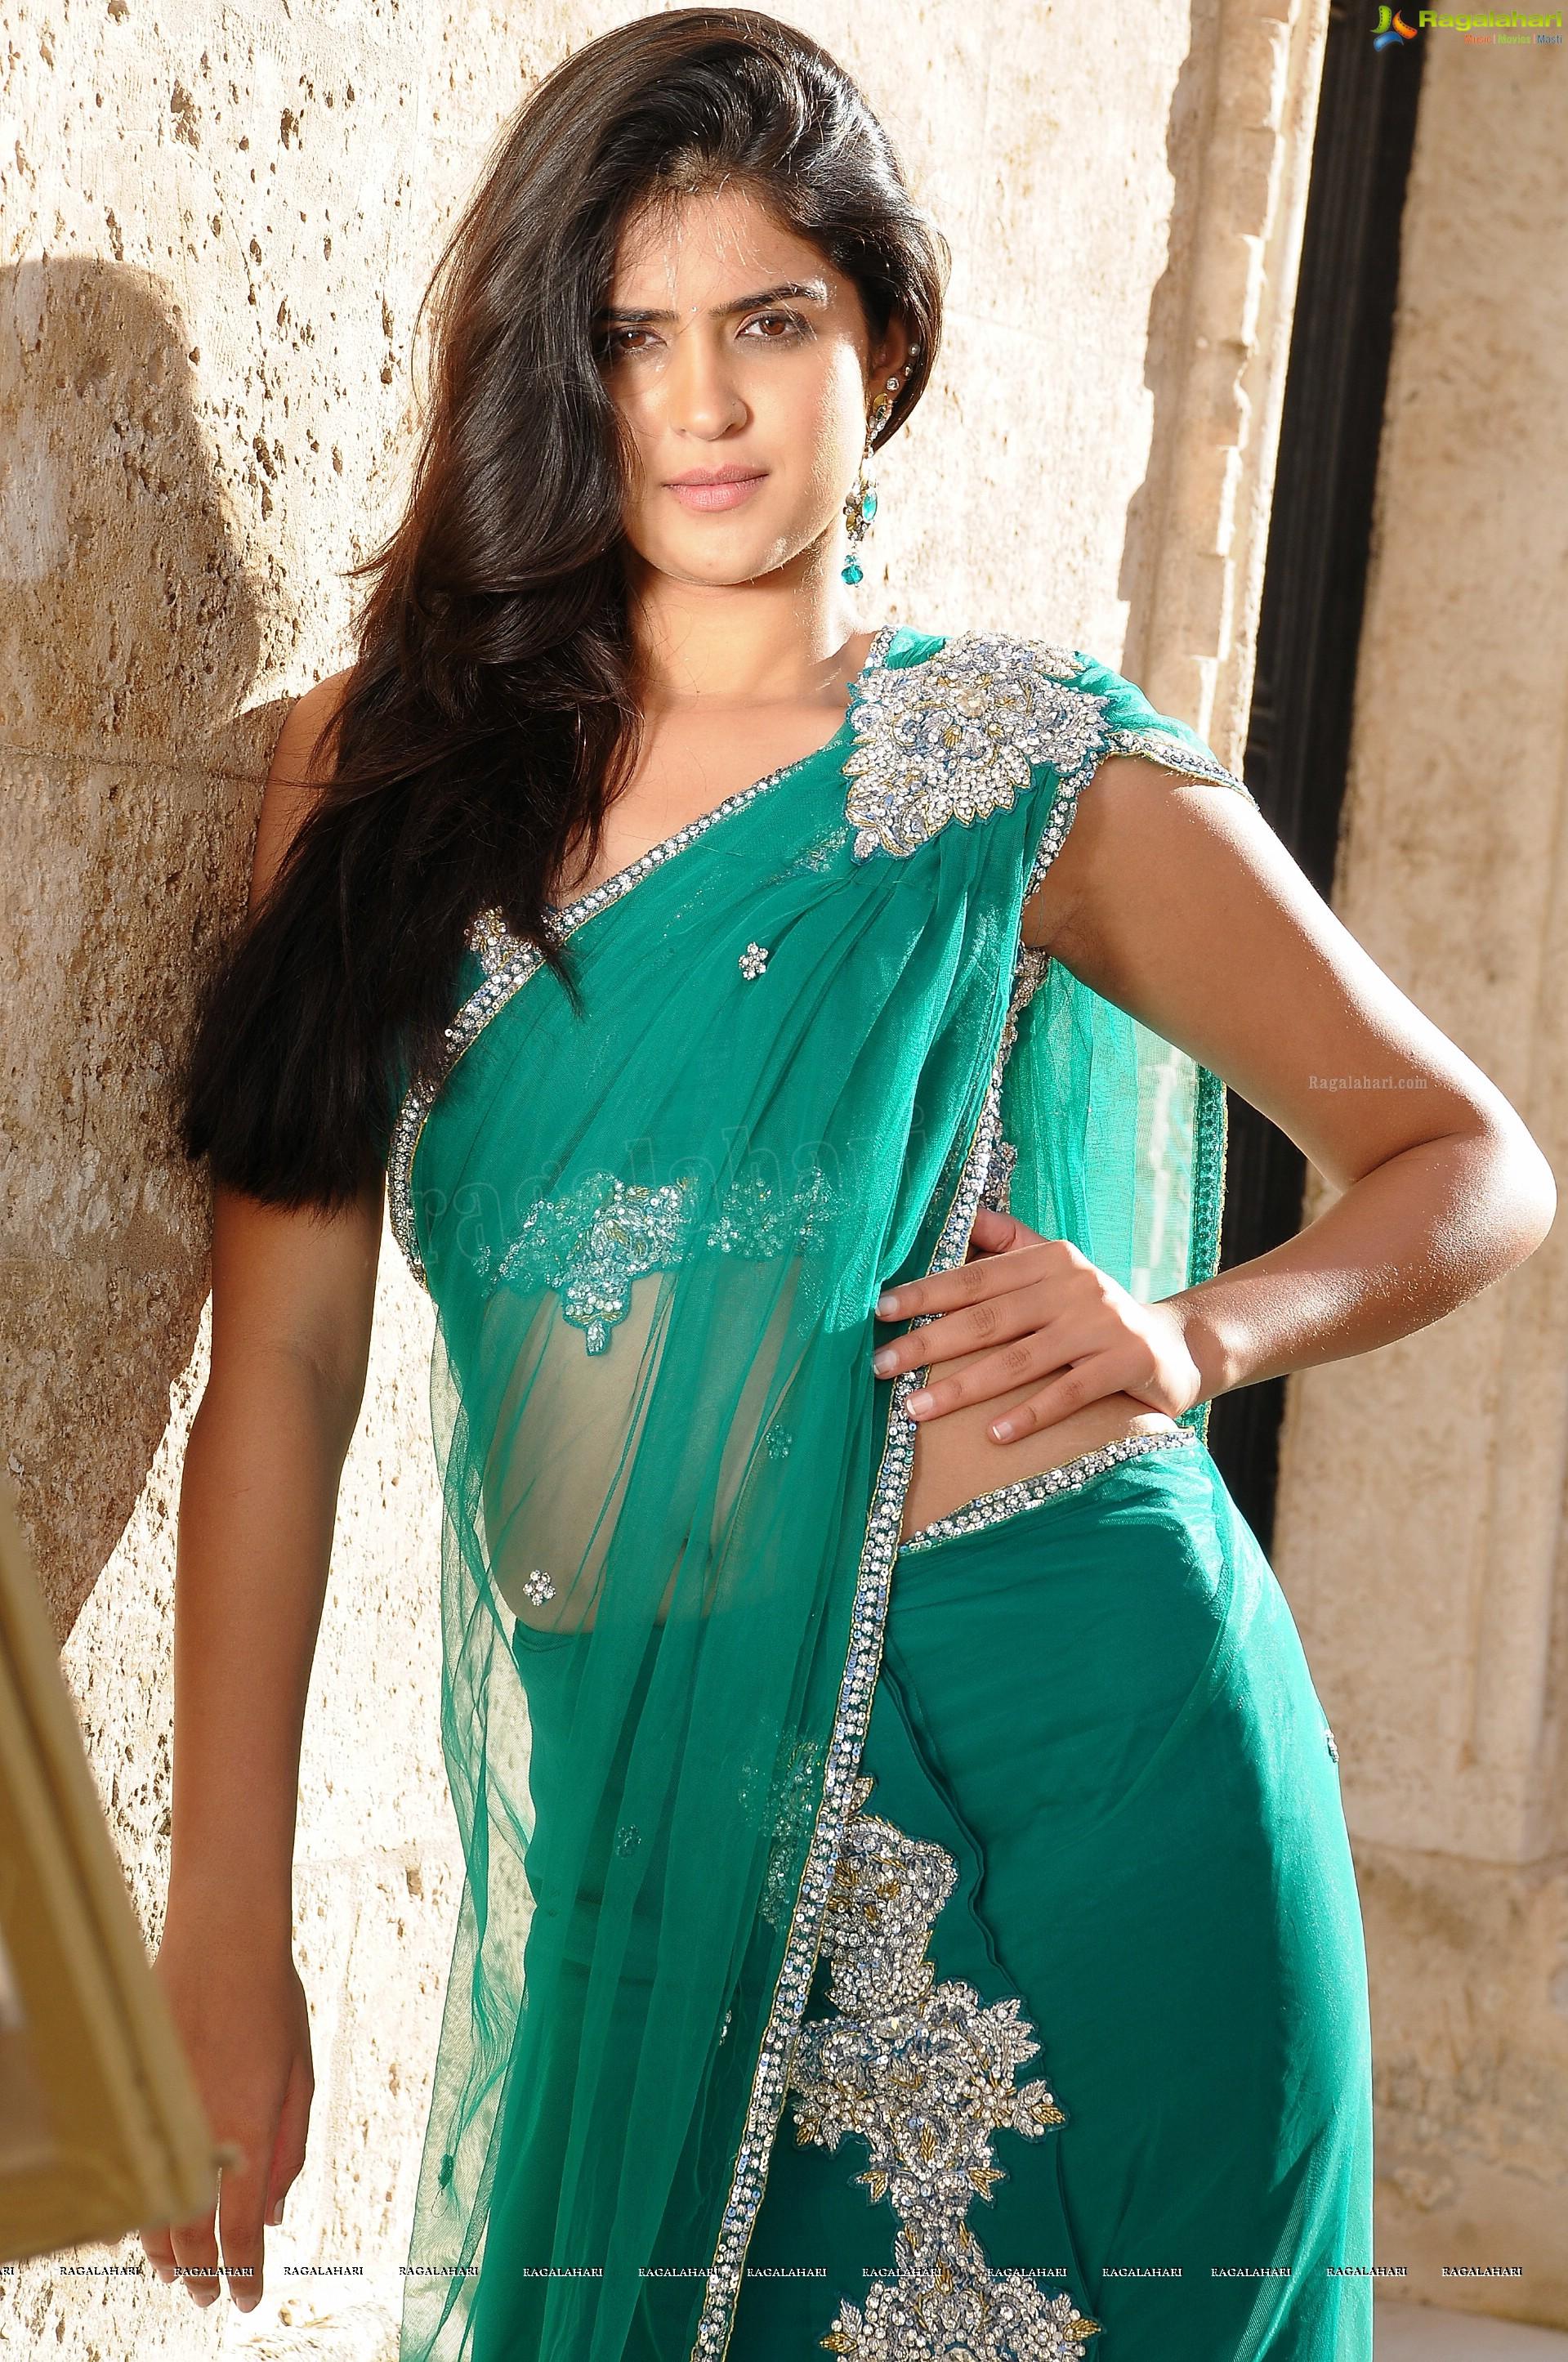 INDIAN SEX PHOTOS - 100% SATISFACTION - Page 8598 - Xossip